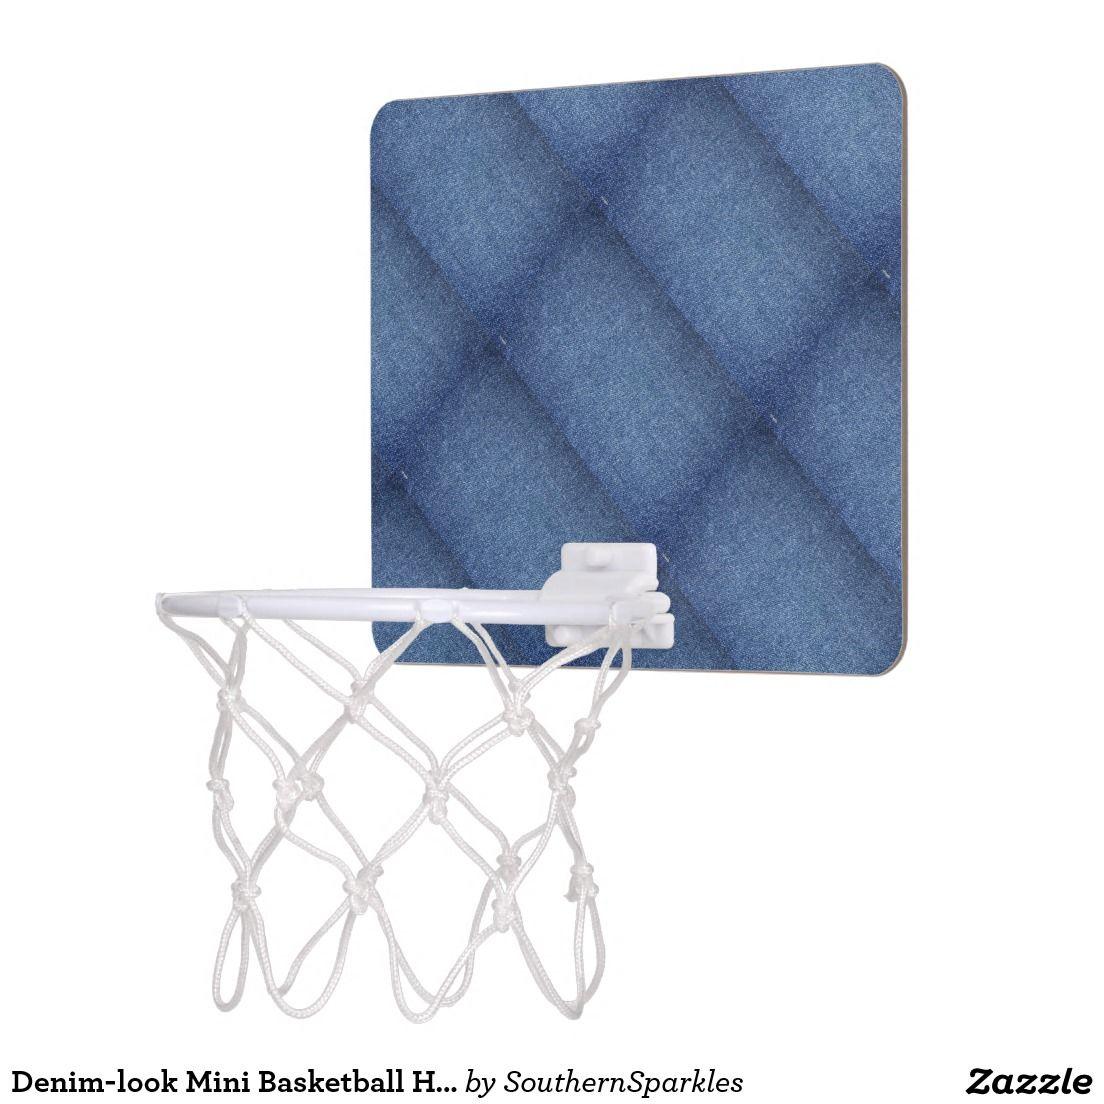 Denim-look Mini Basketball Hoop